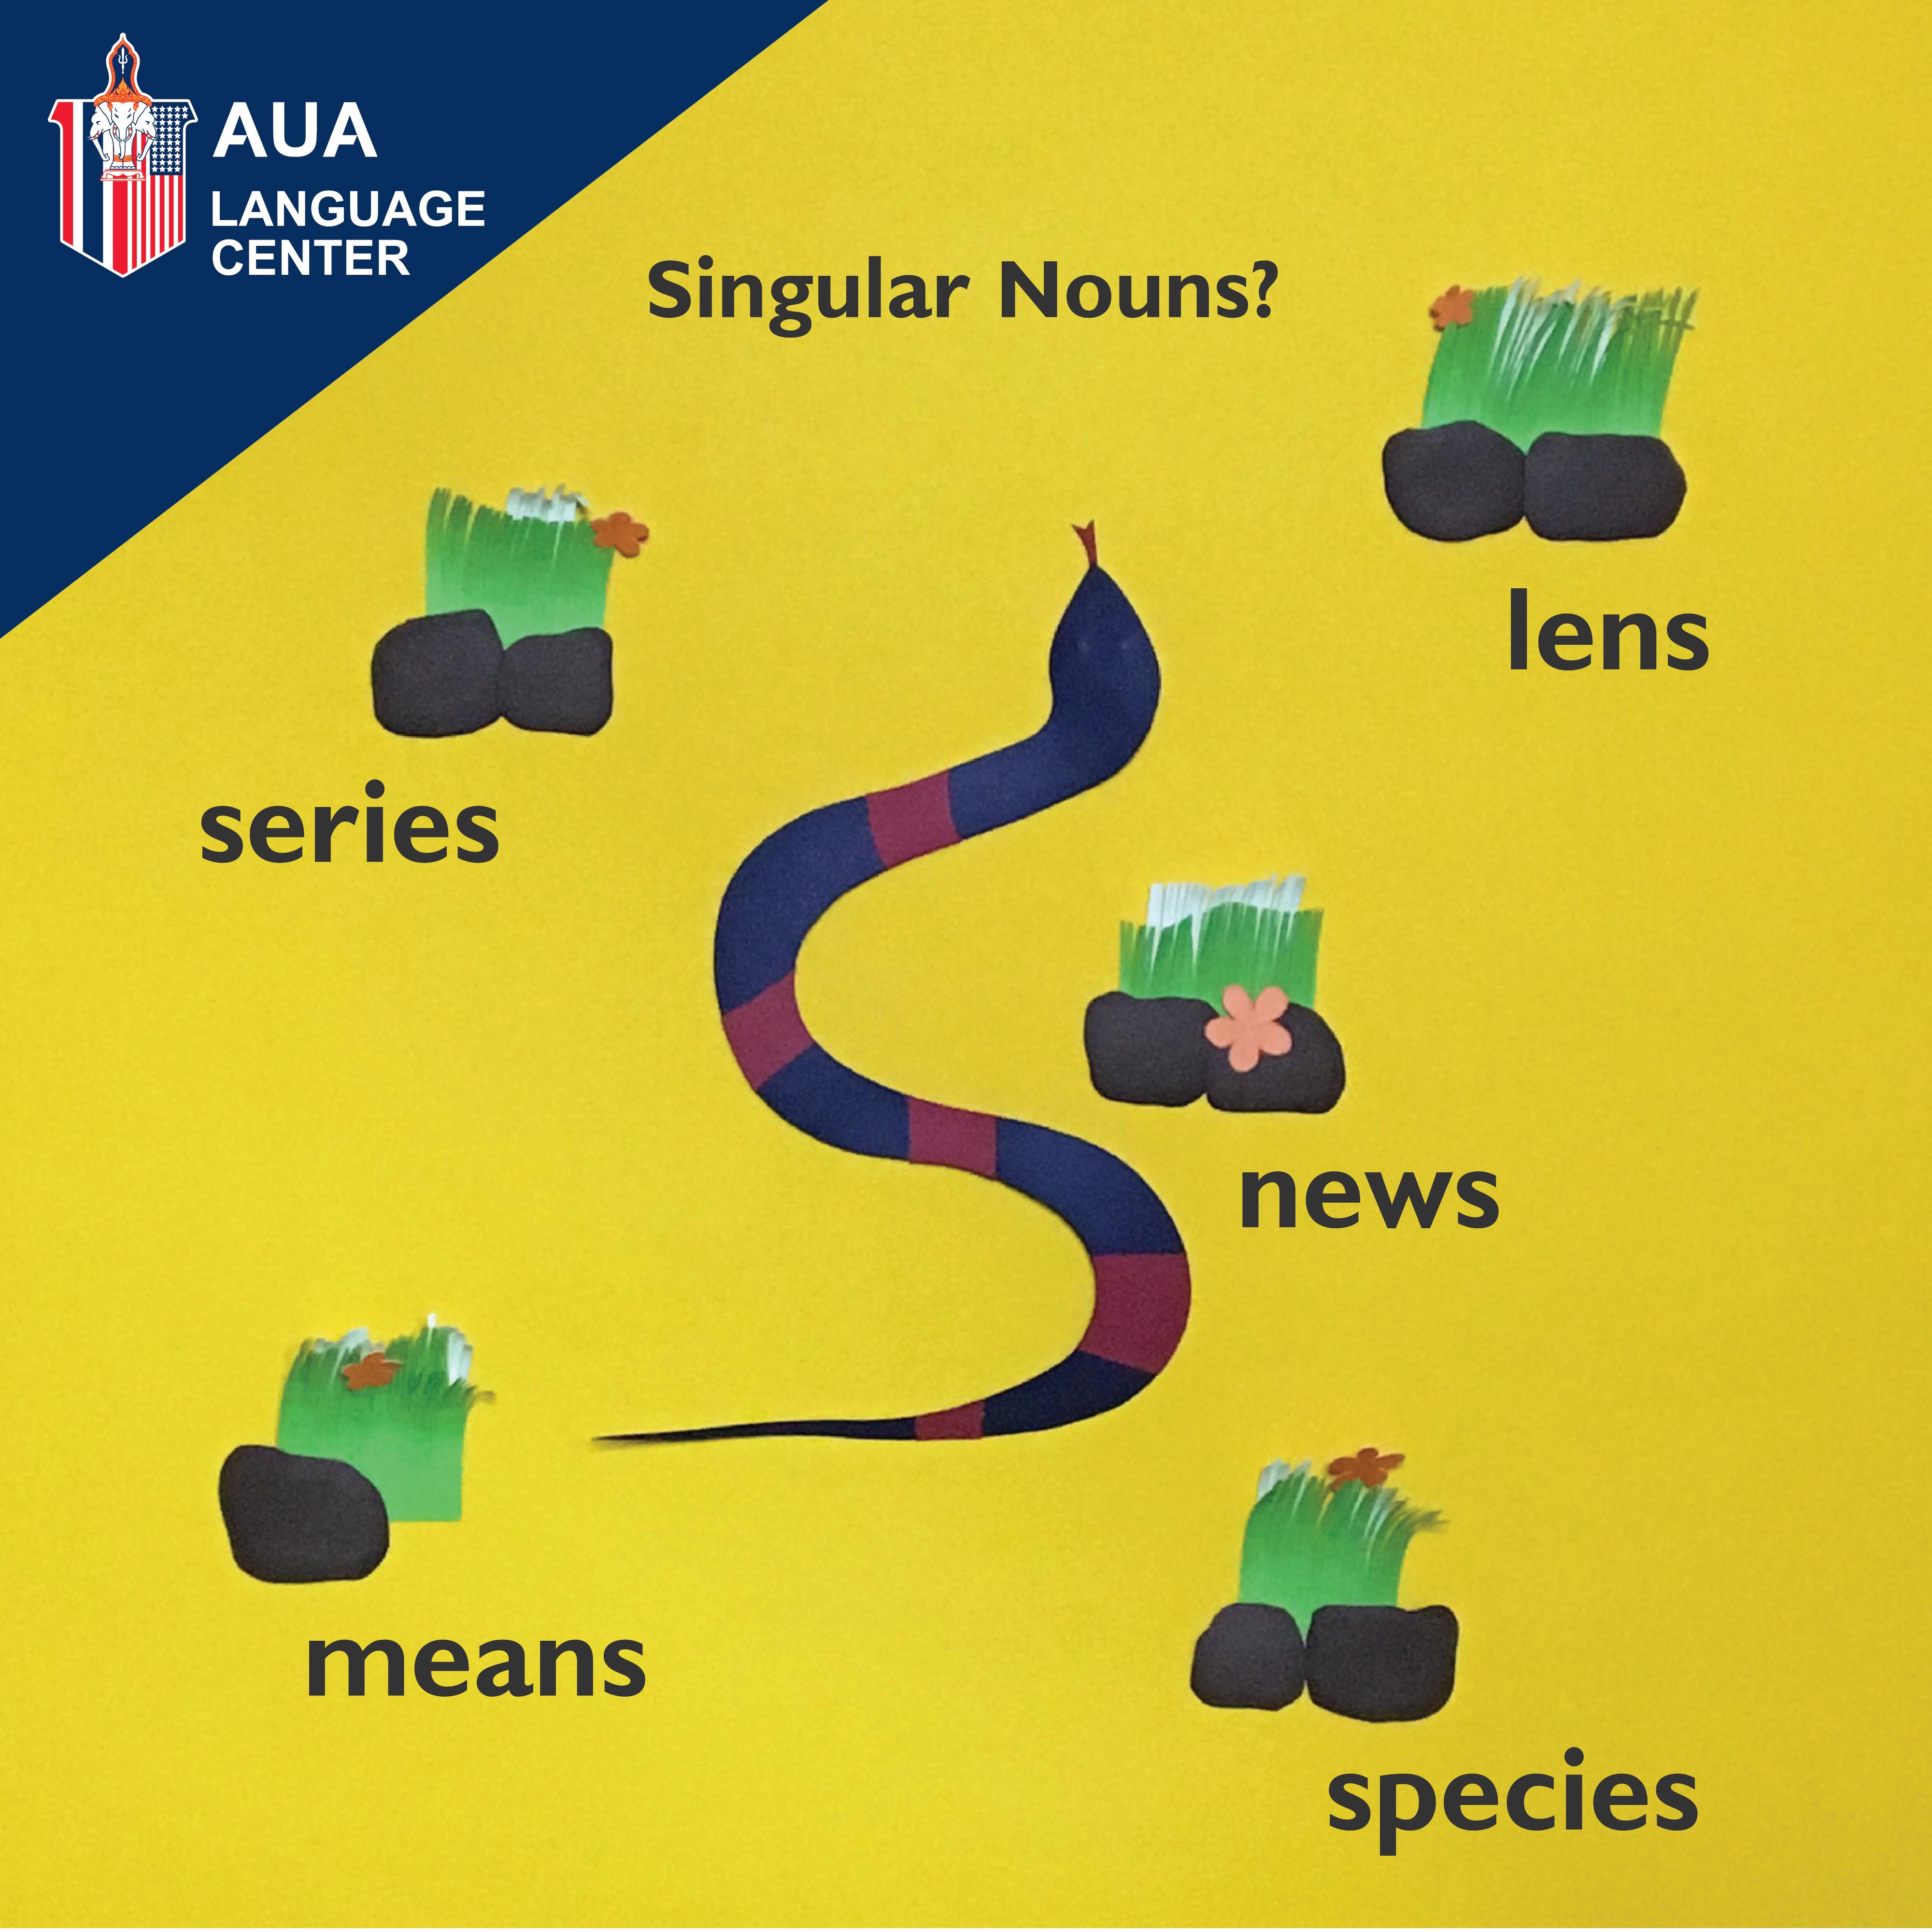 Singular nouns that end in -s